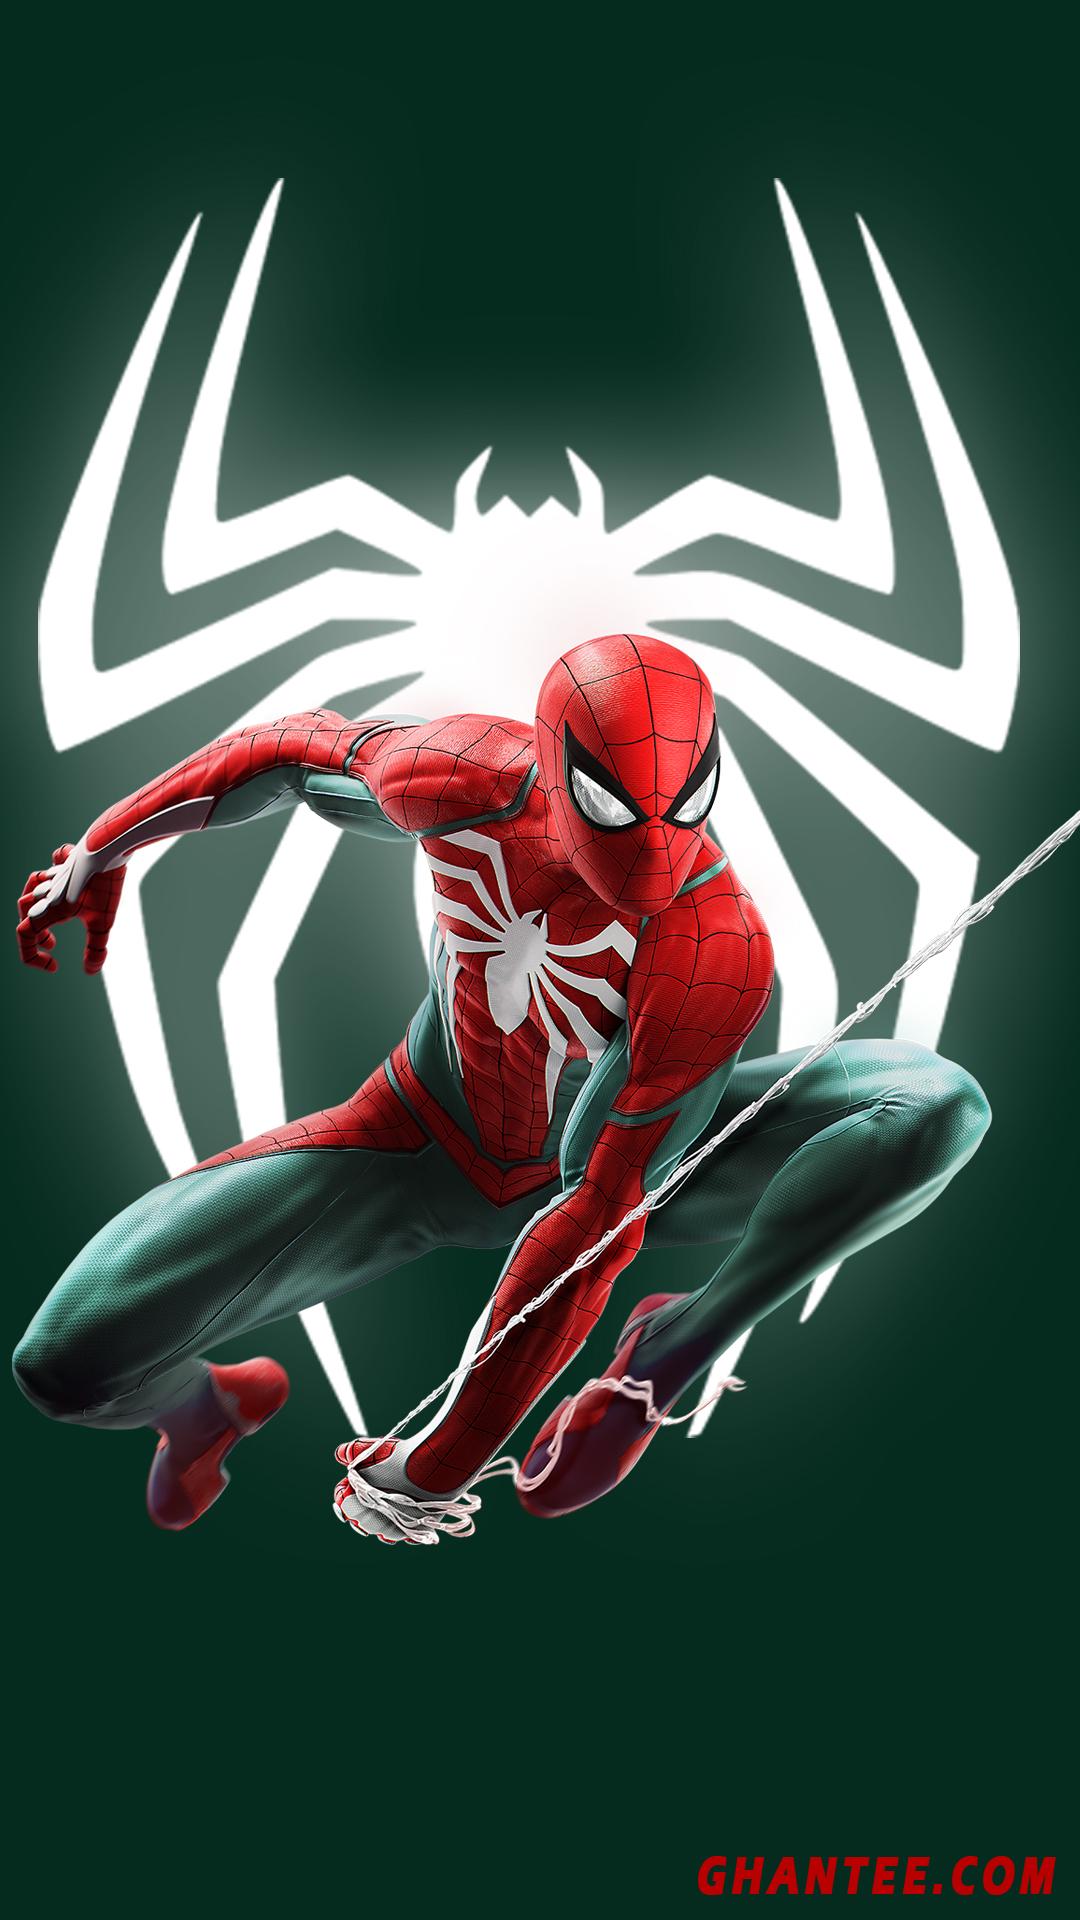 spider man wallpaper hd for phone | green bg | full HD